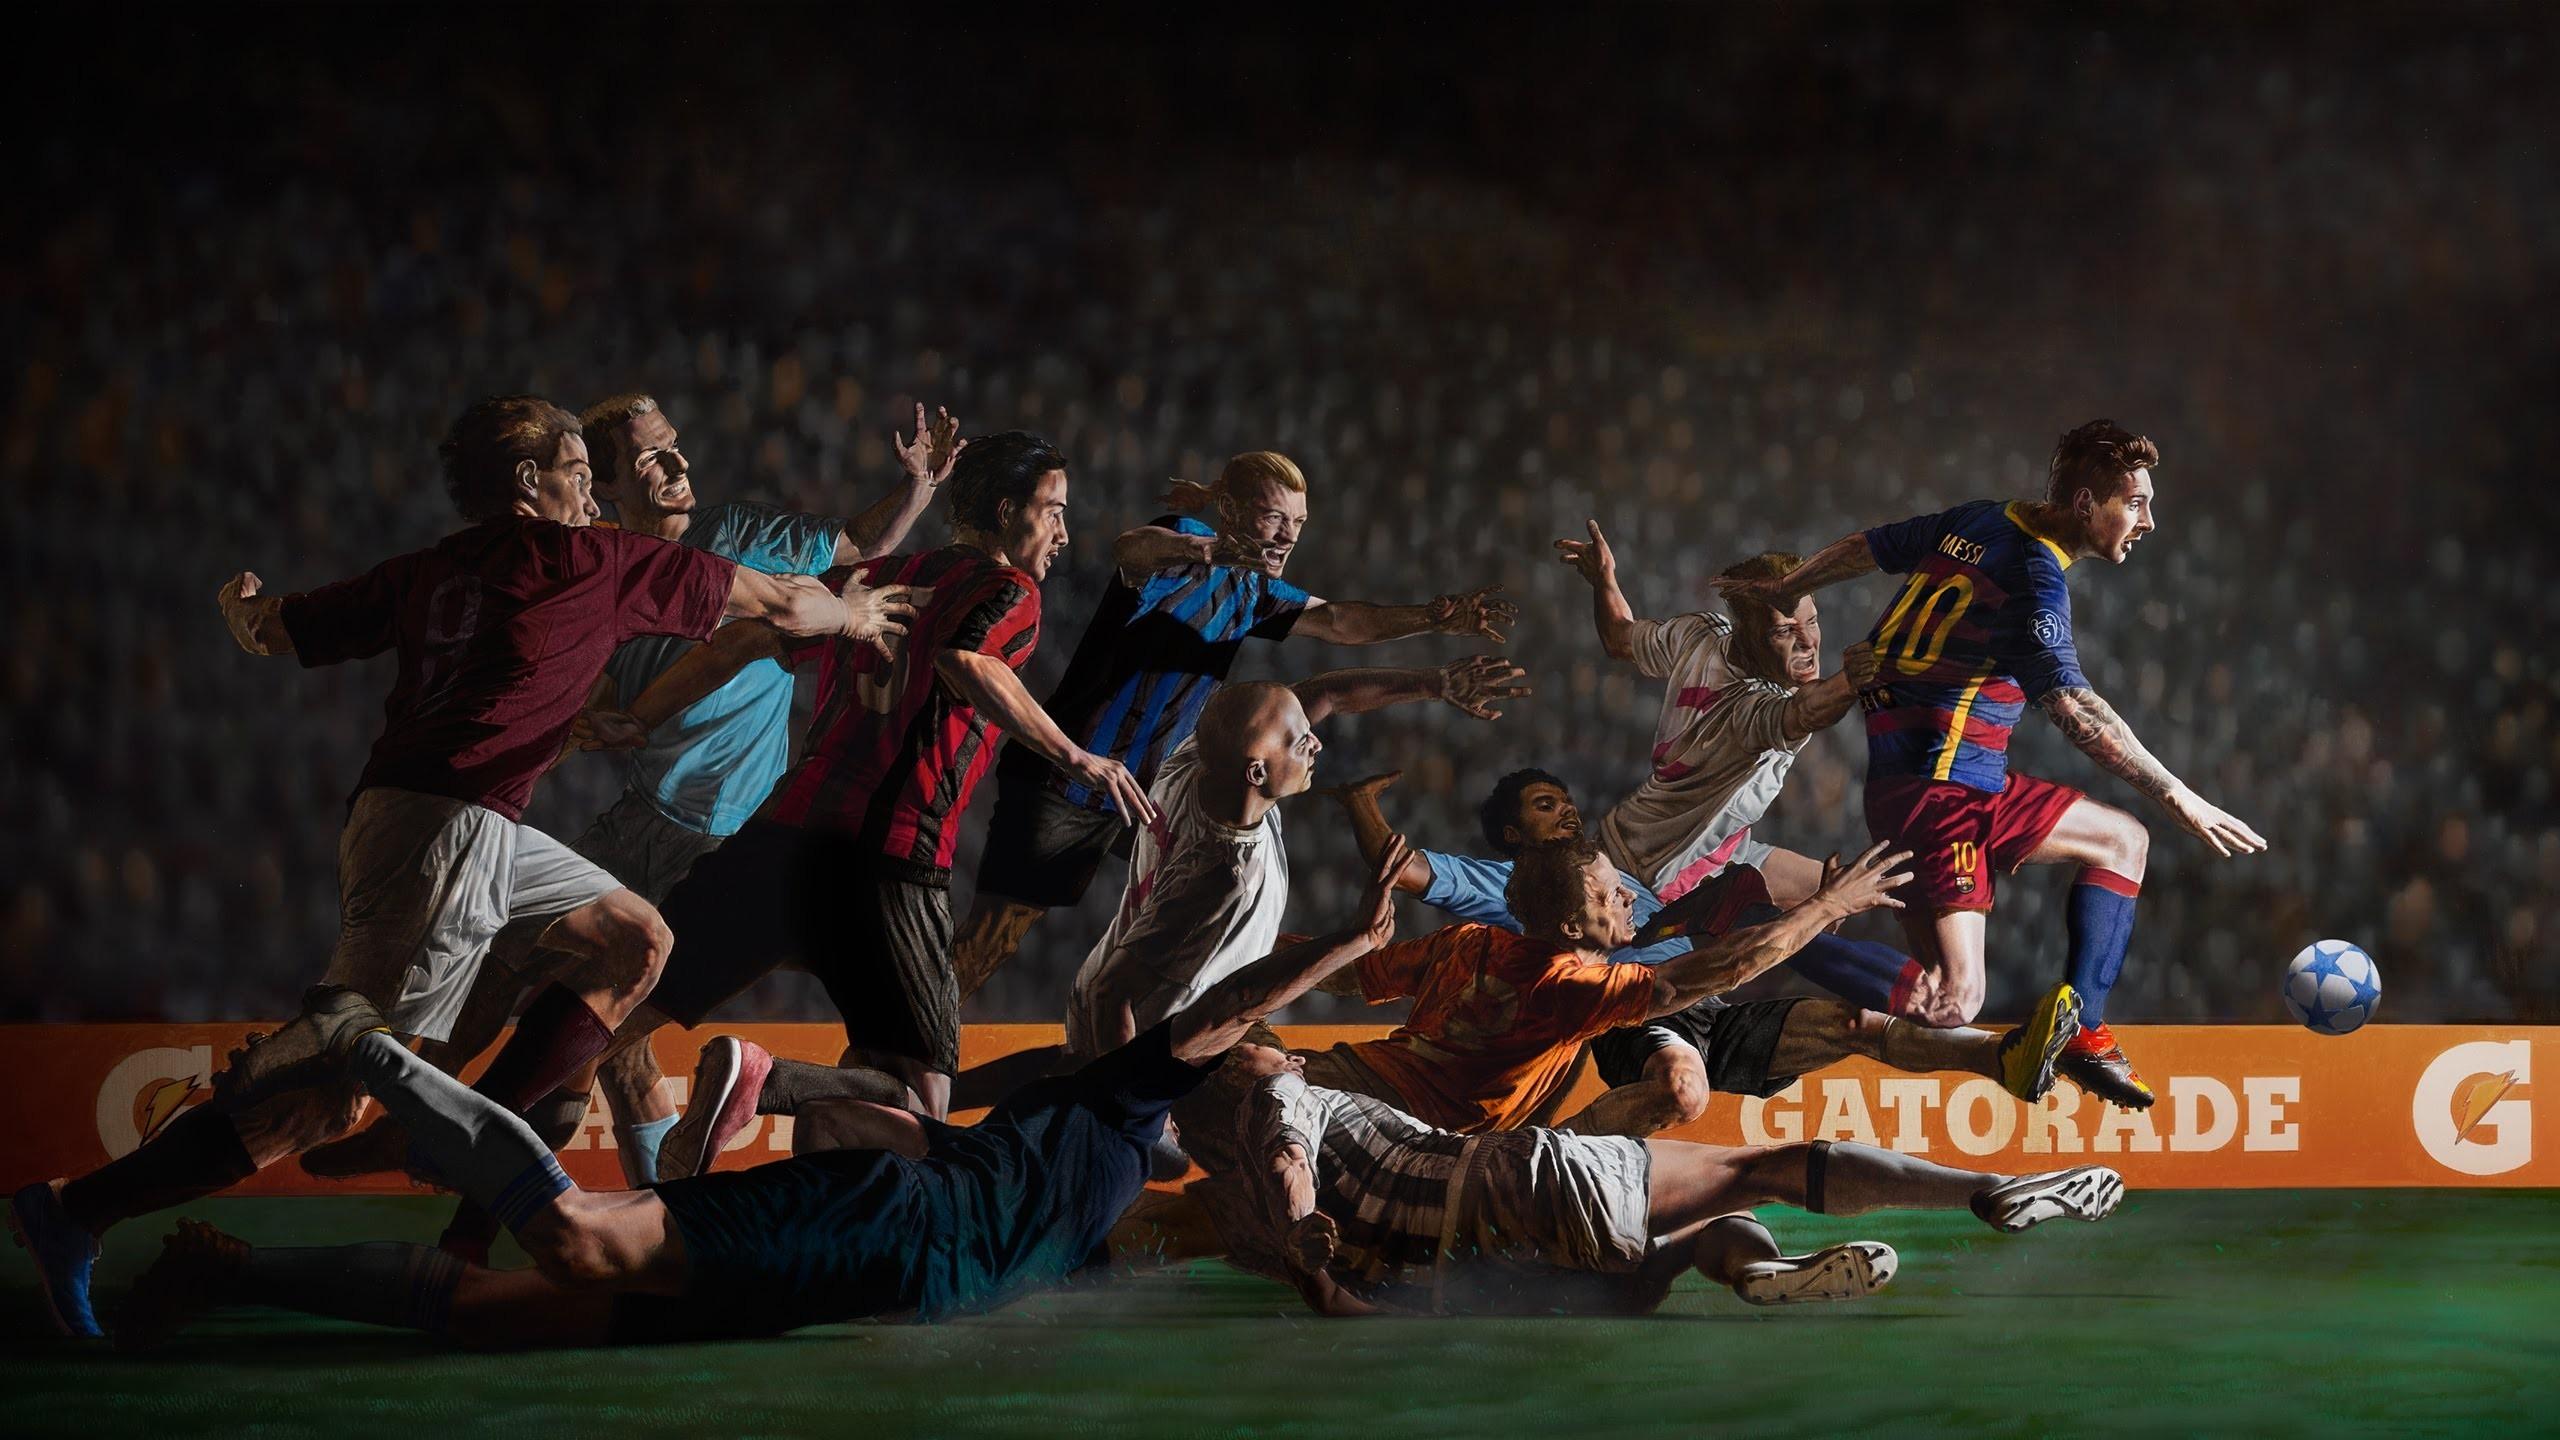 Fc Barcelona 2017 Wallpaper ·①